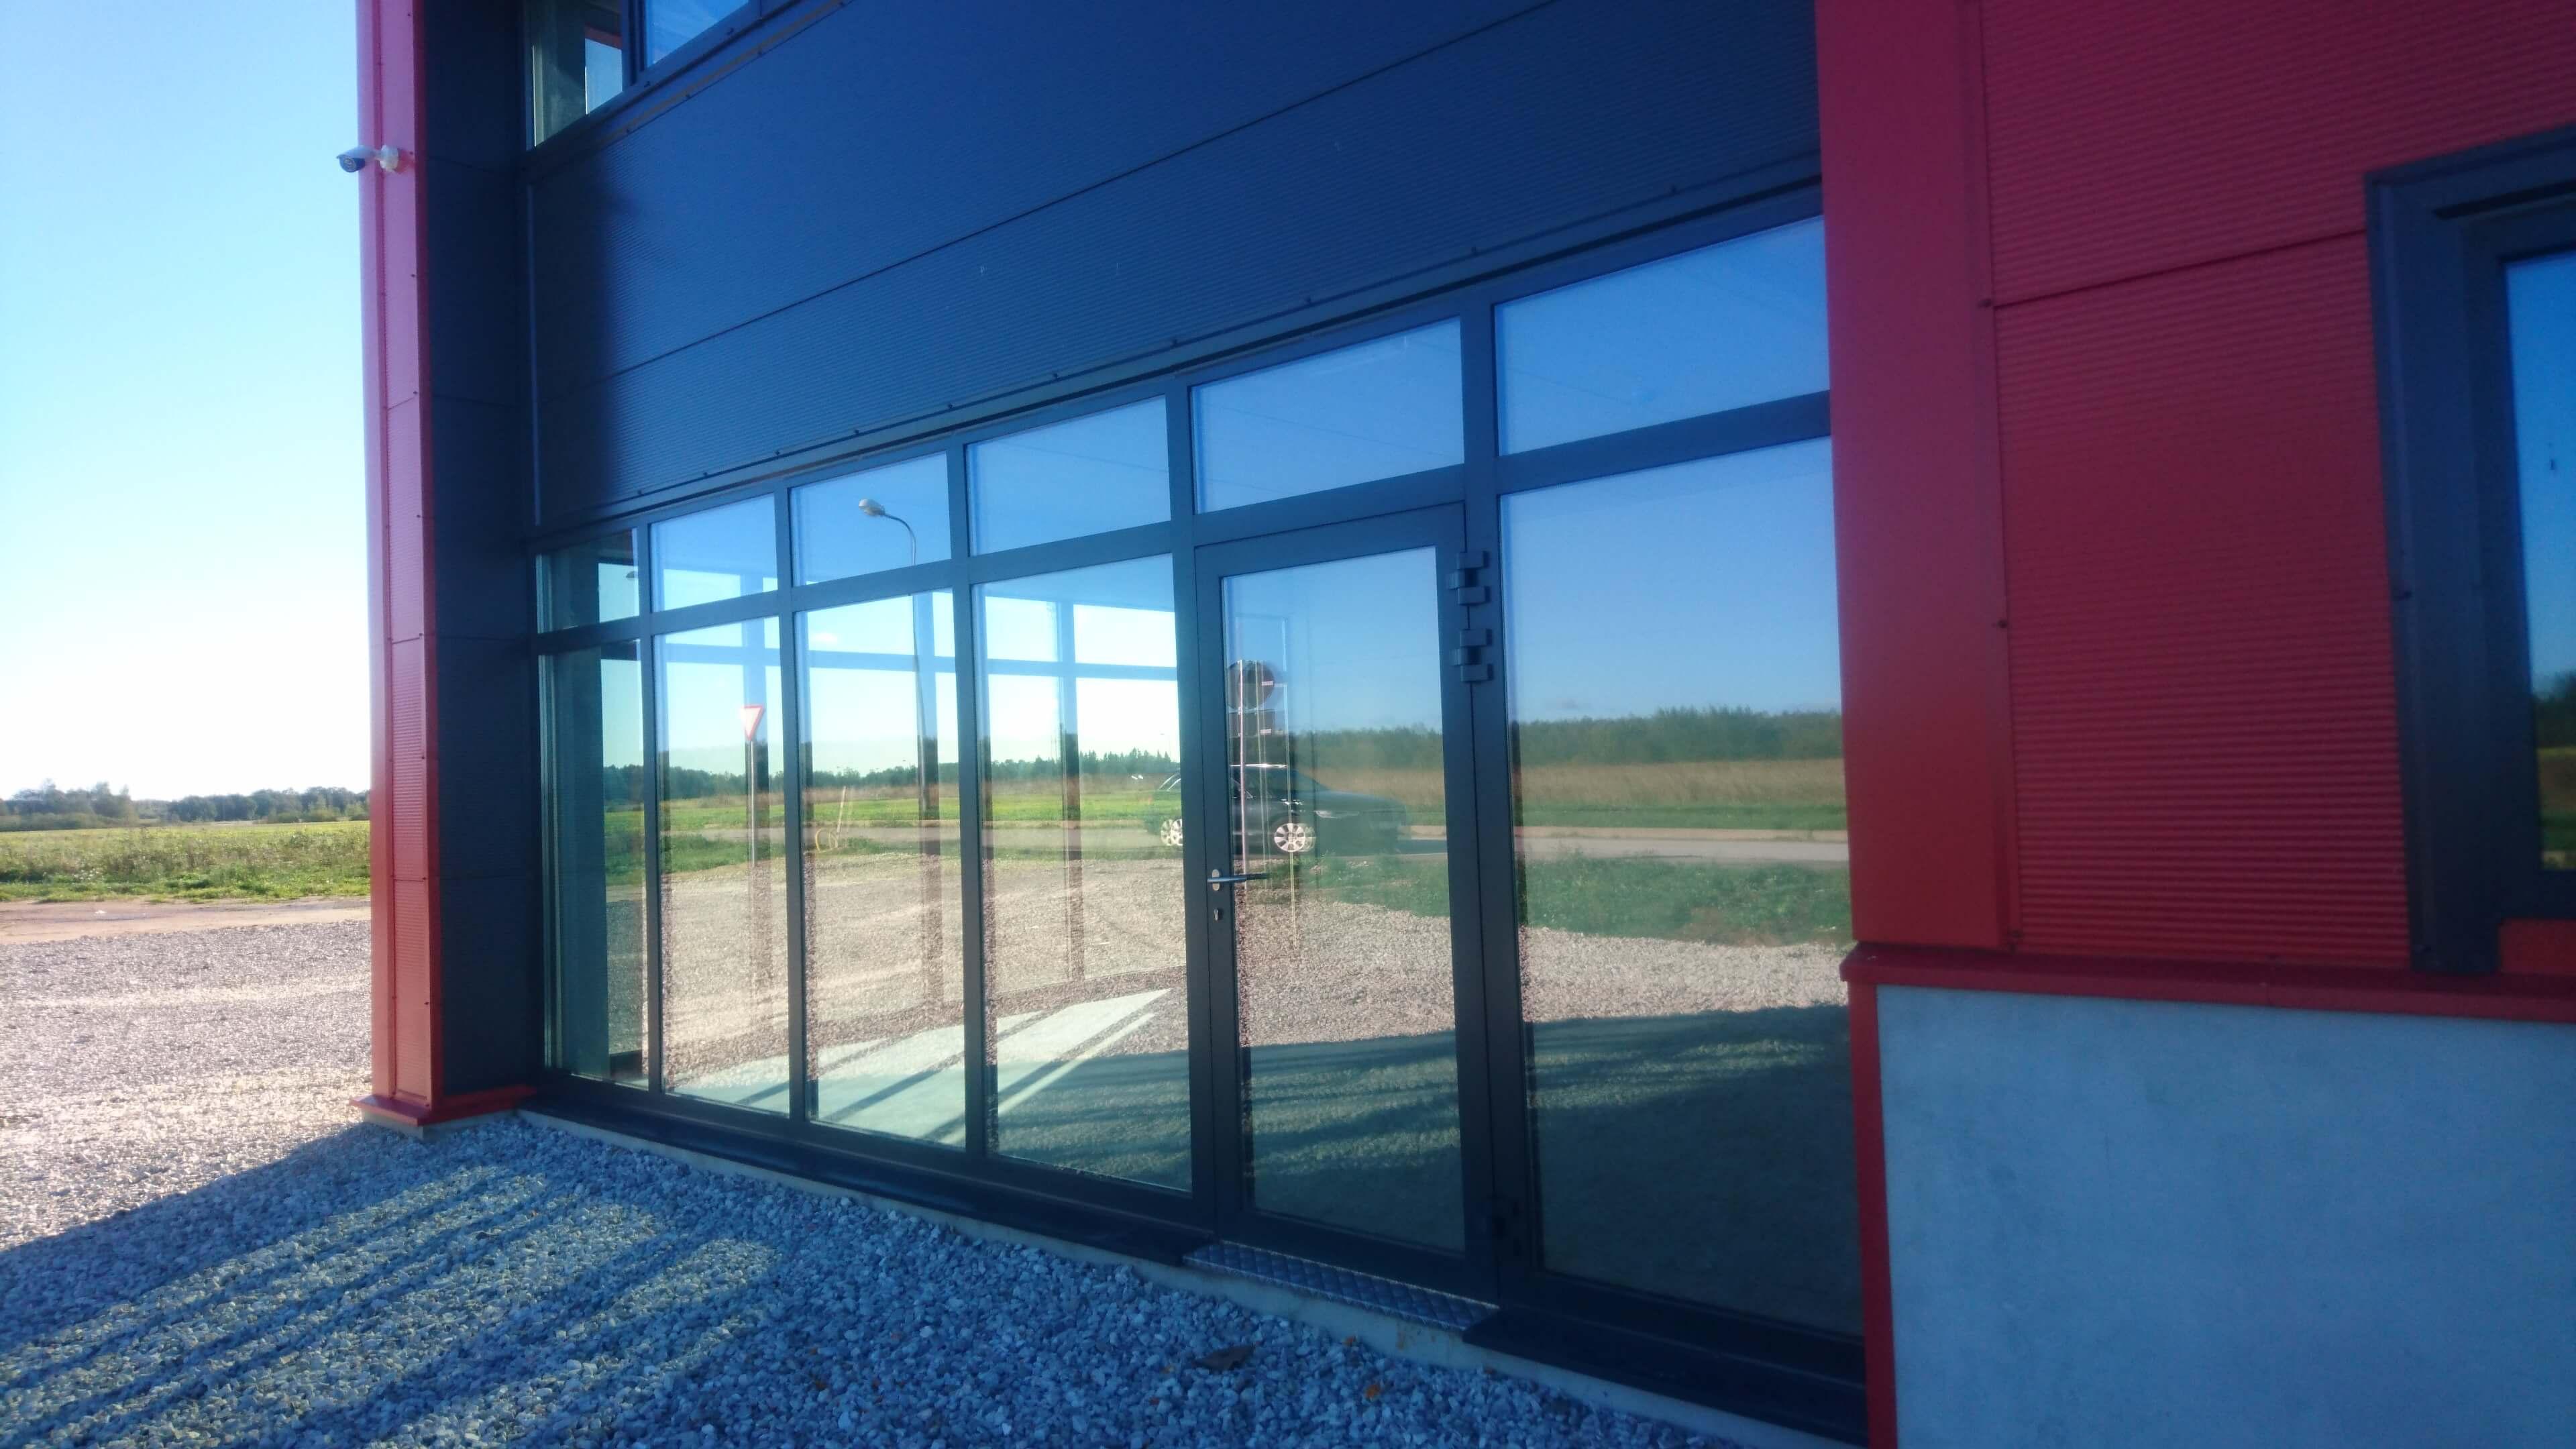 Alumiiniumprofiilist avatäited tööstushoonele